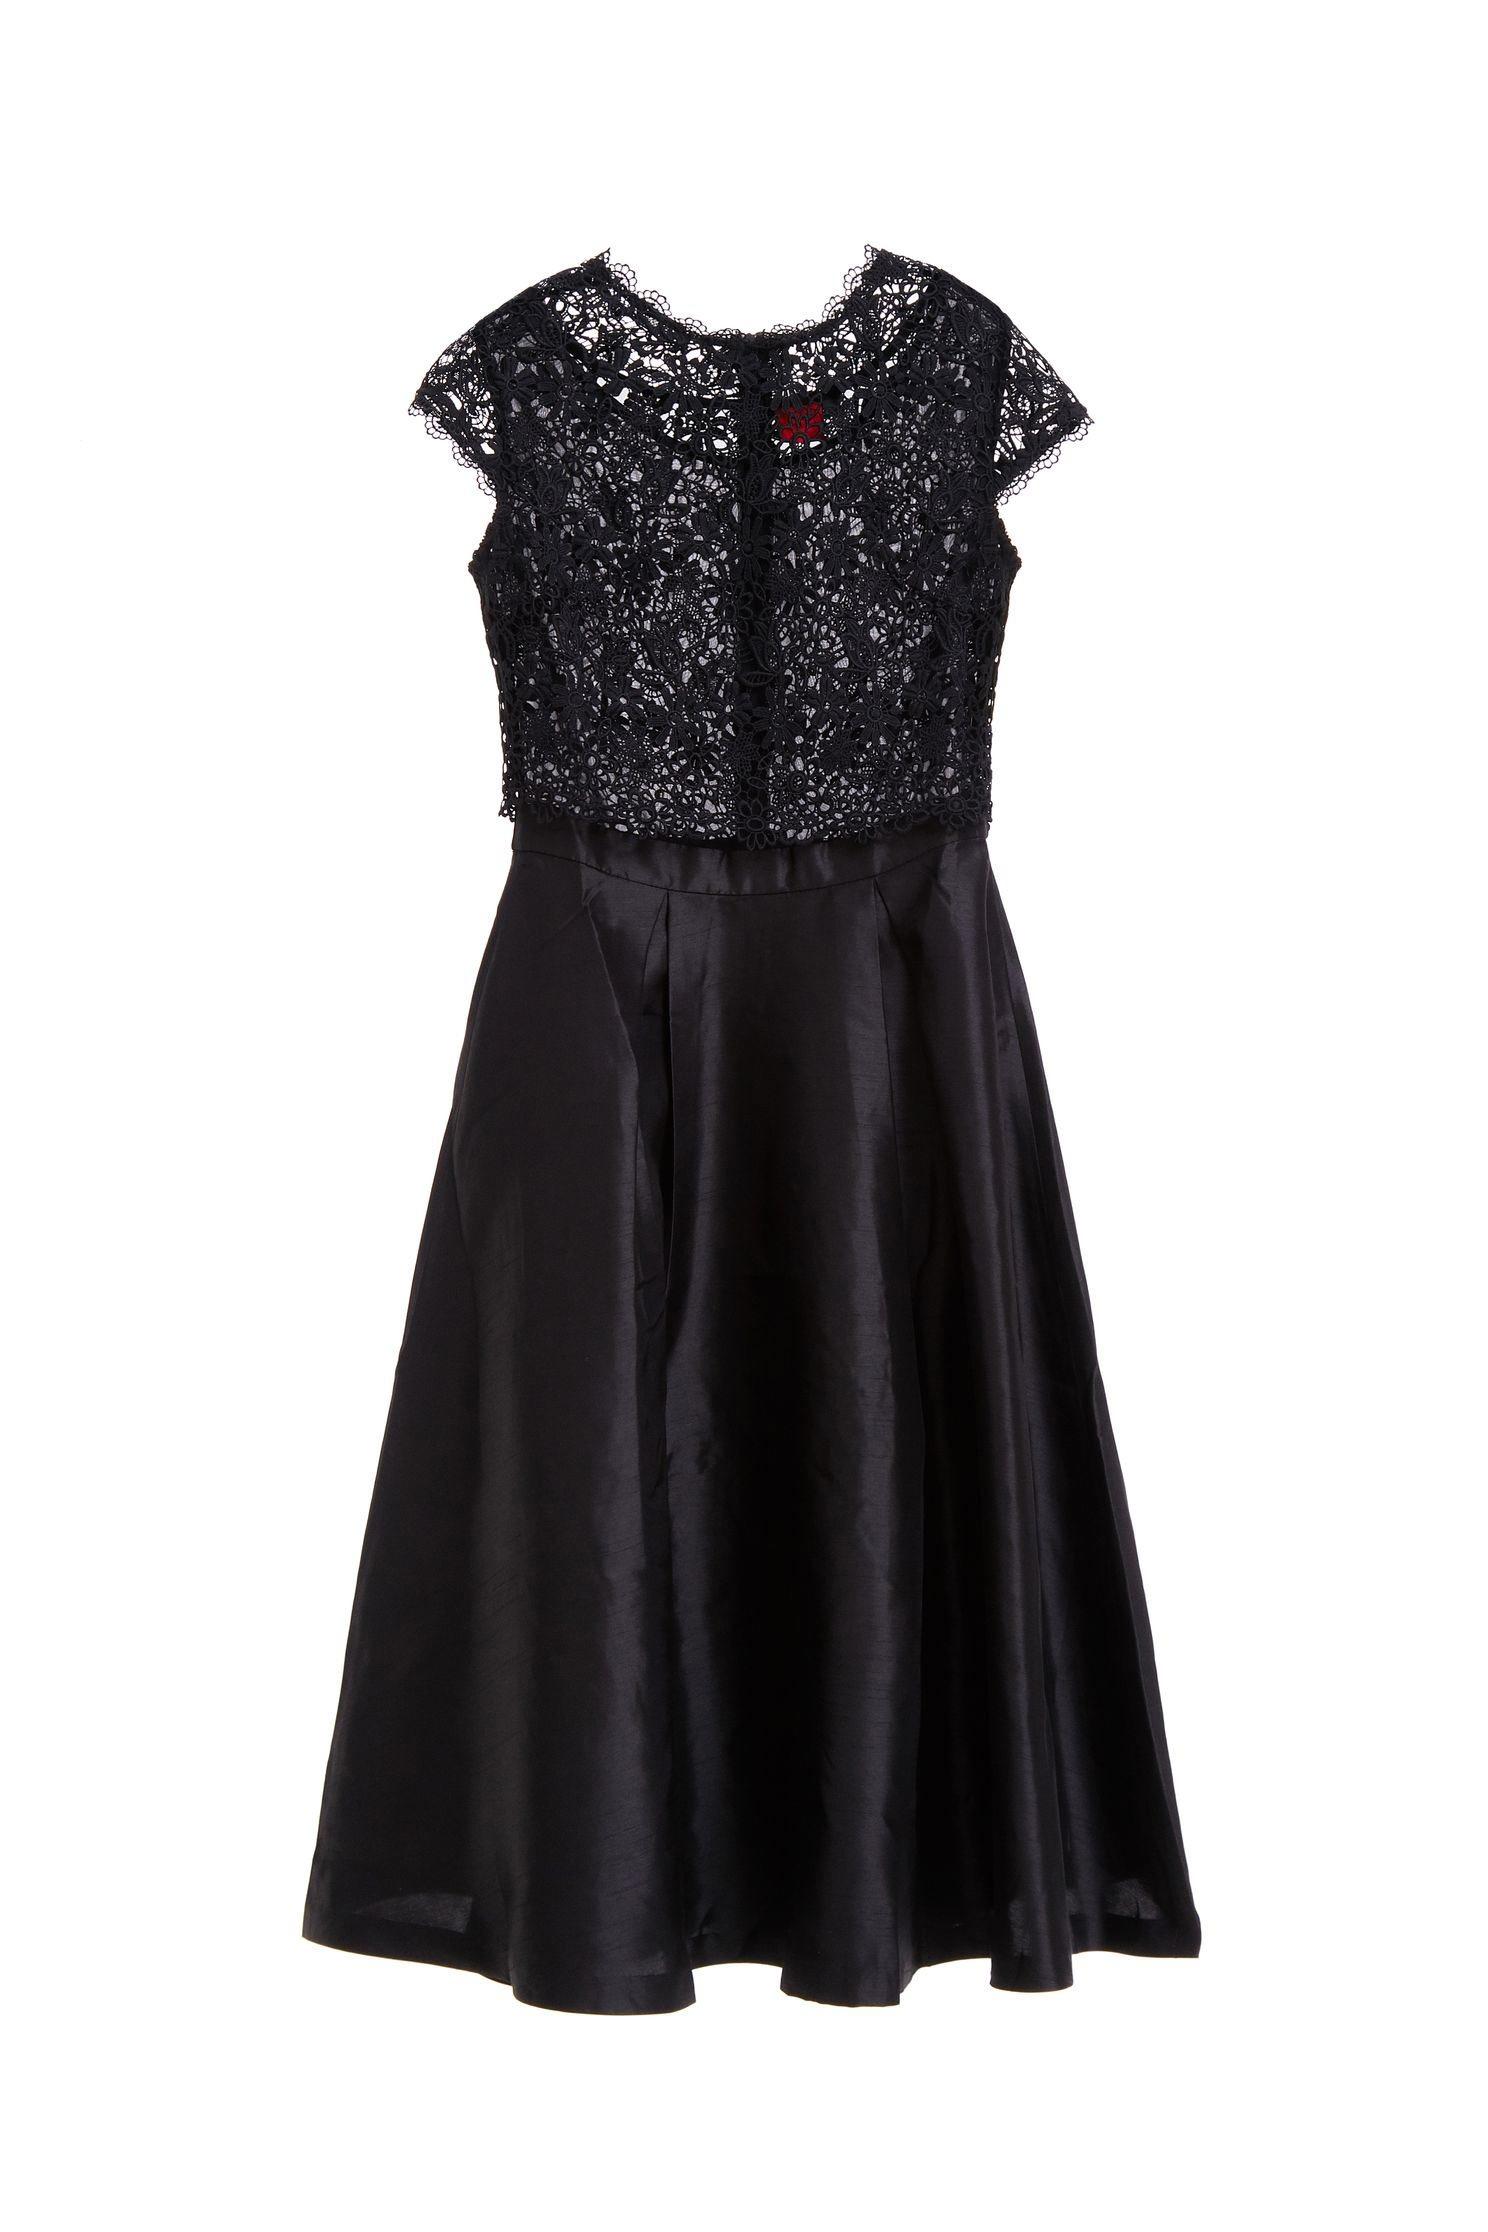 Lace stitching gorgeous dress,cocktaildress,shortsleevedress,lace,lacedress,longdress,blackdress